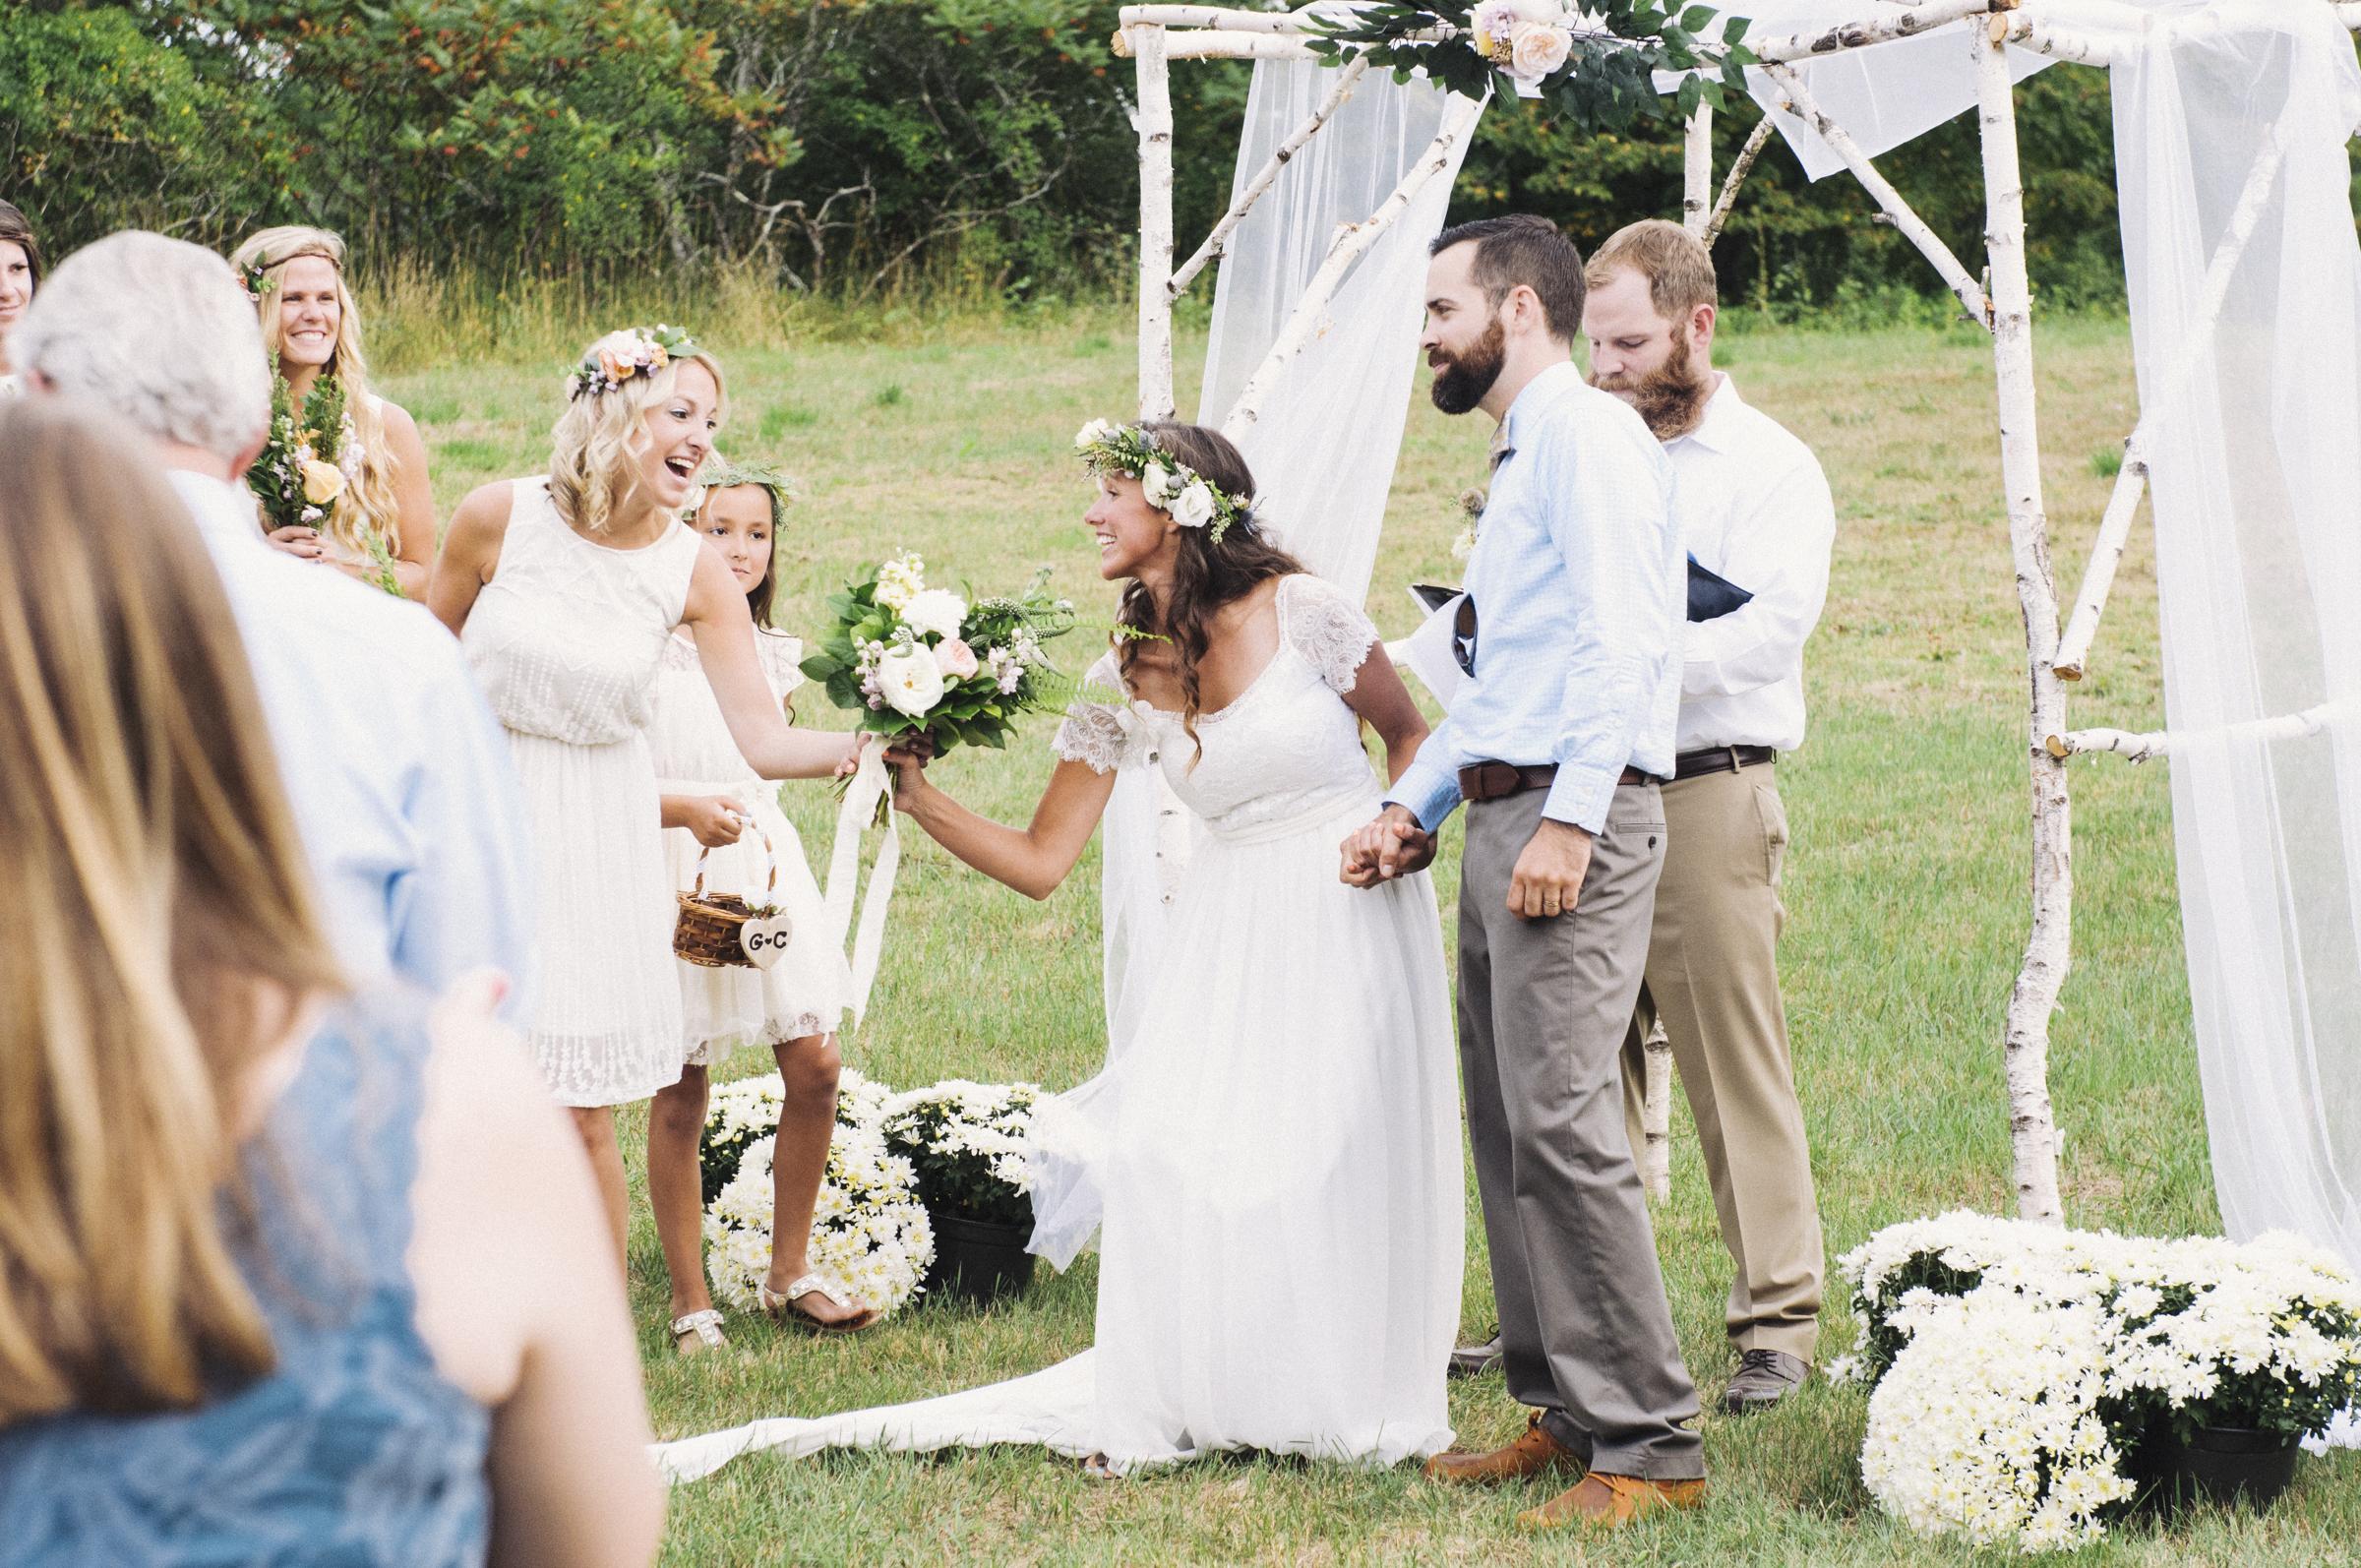 20150913_SimpsonProulx_Wedding_©meghanireland2015_00127.jpg